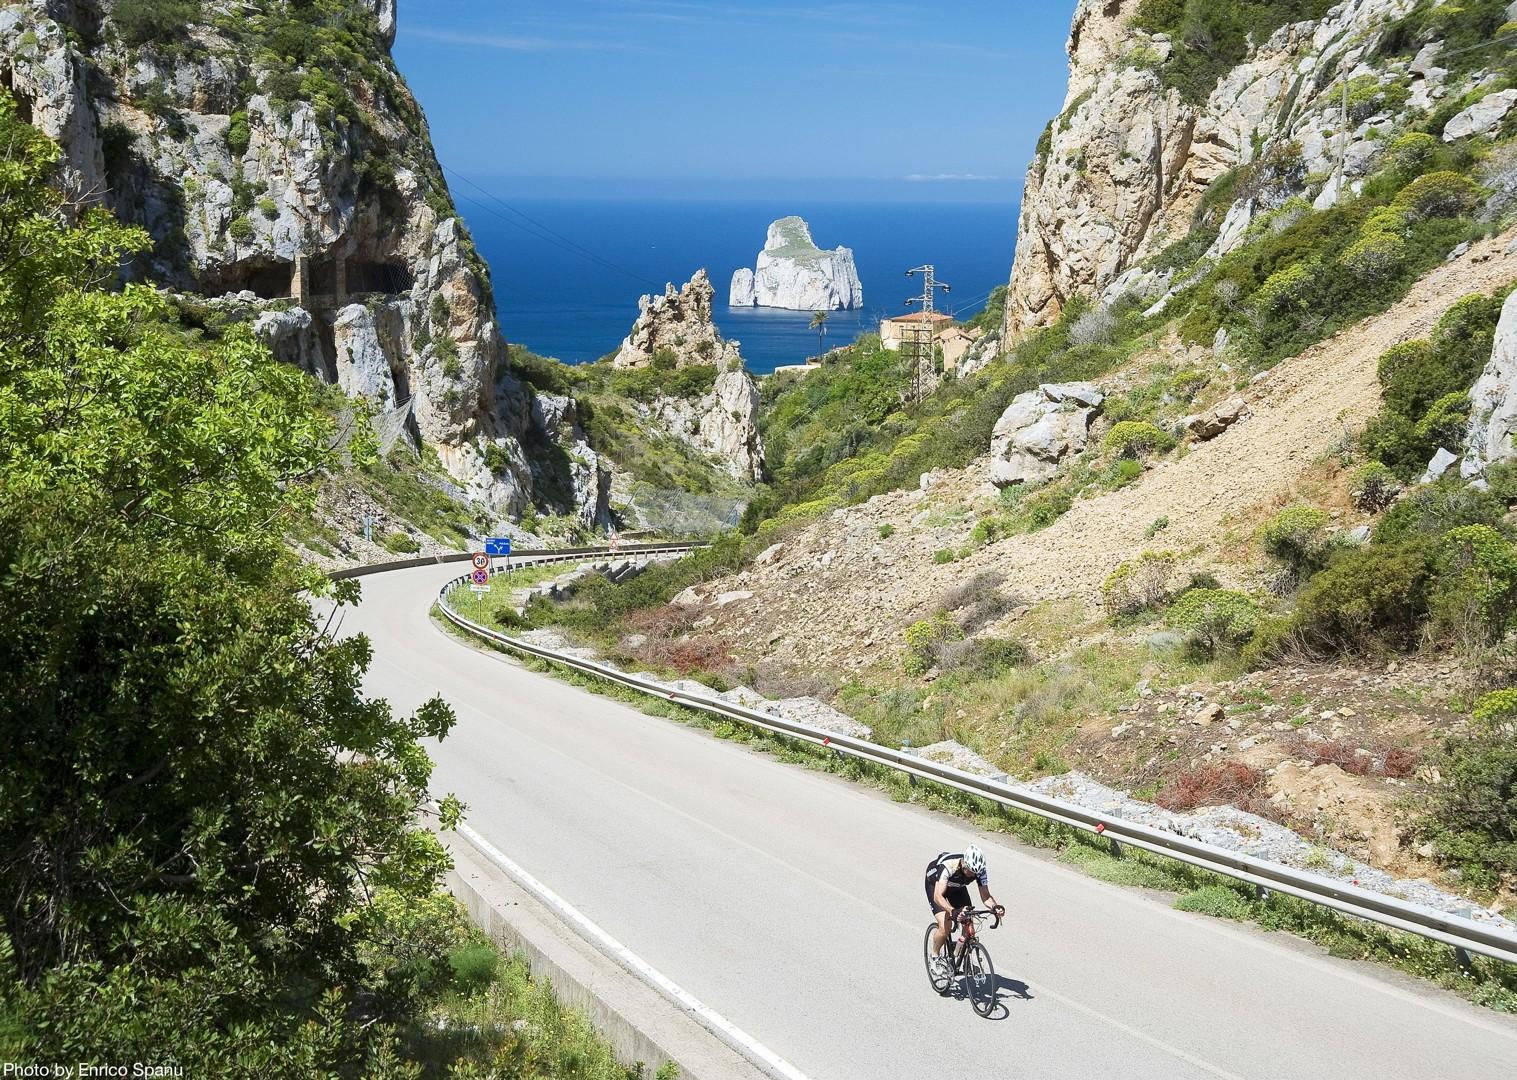 _Holiday.300.18045.jpg - Italy - Net Trade Rate - Coastal TranSardinia - Self-Guided Road Cycling Holiday - Italia Road Cycling